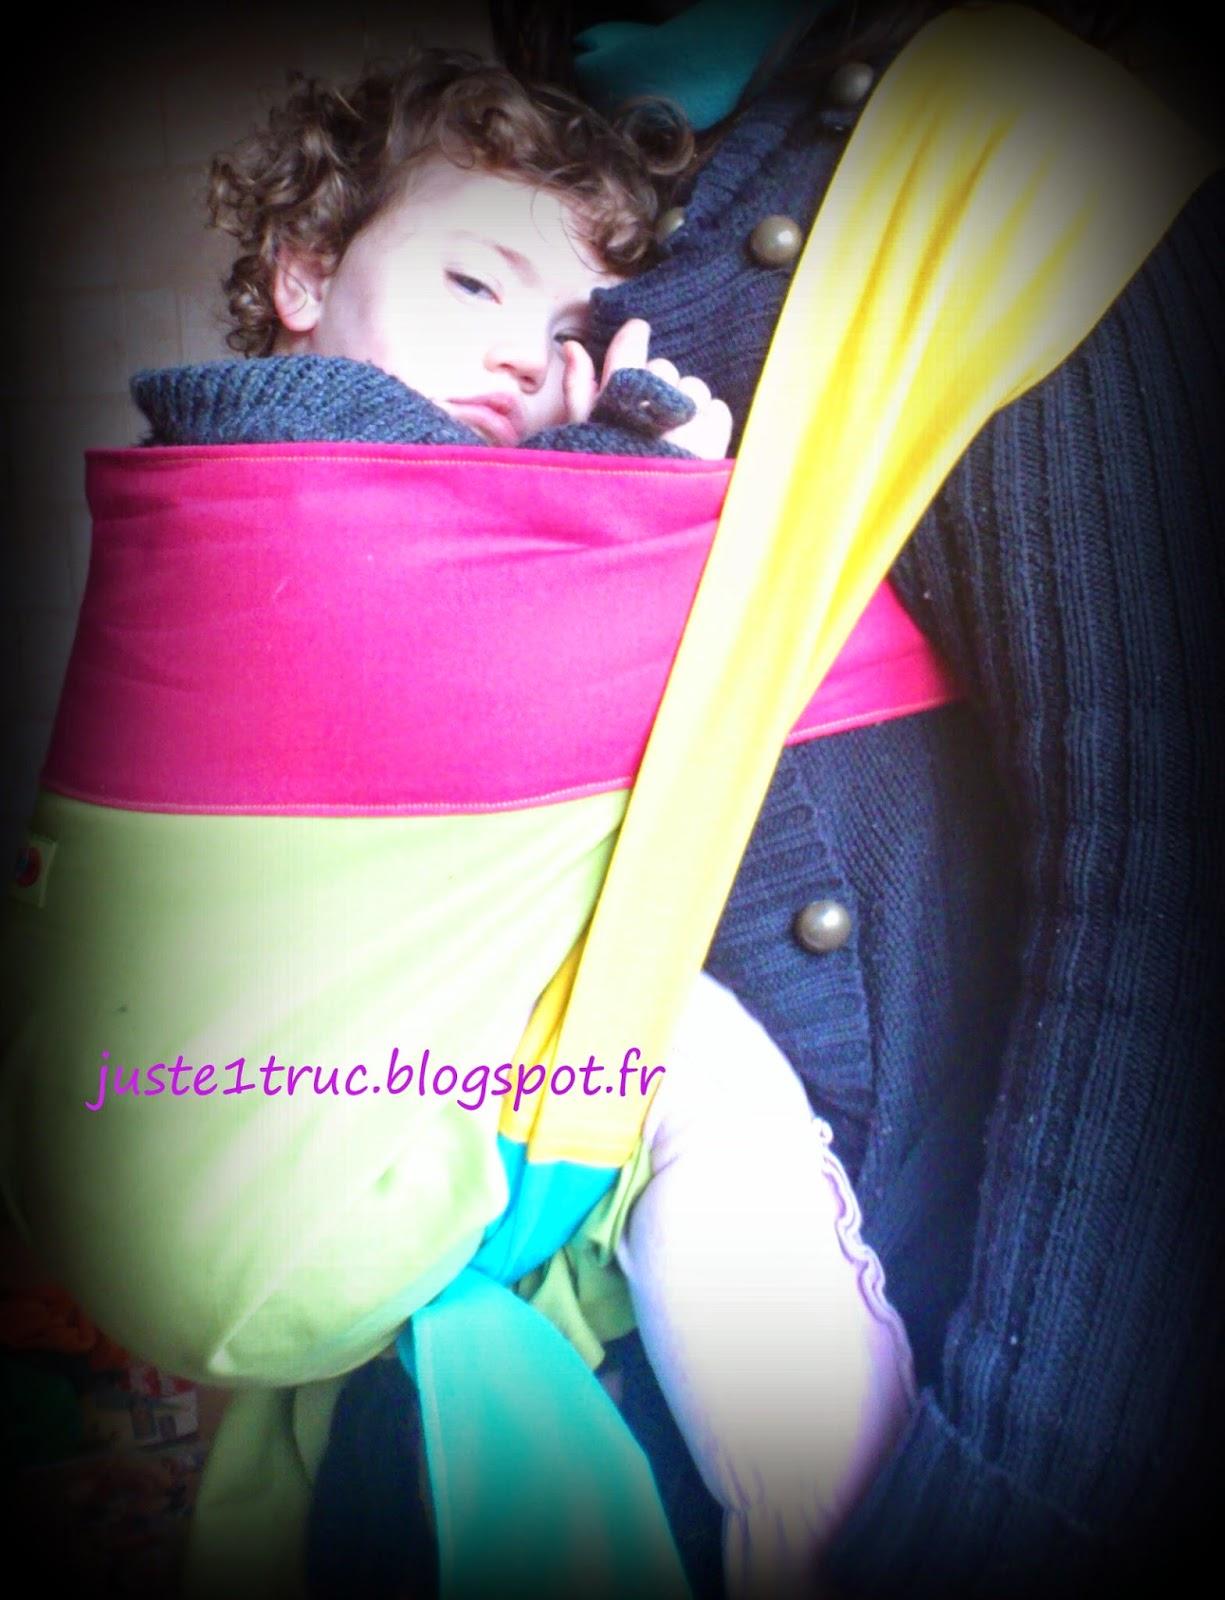 podeagi froid hiver soleil chaleur portage babywearing f6f404b0b05